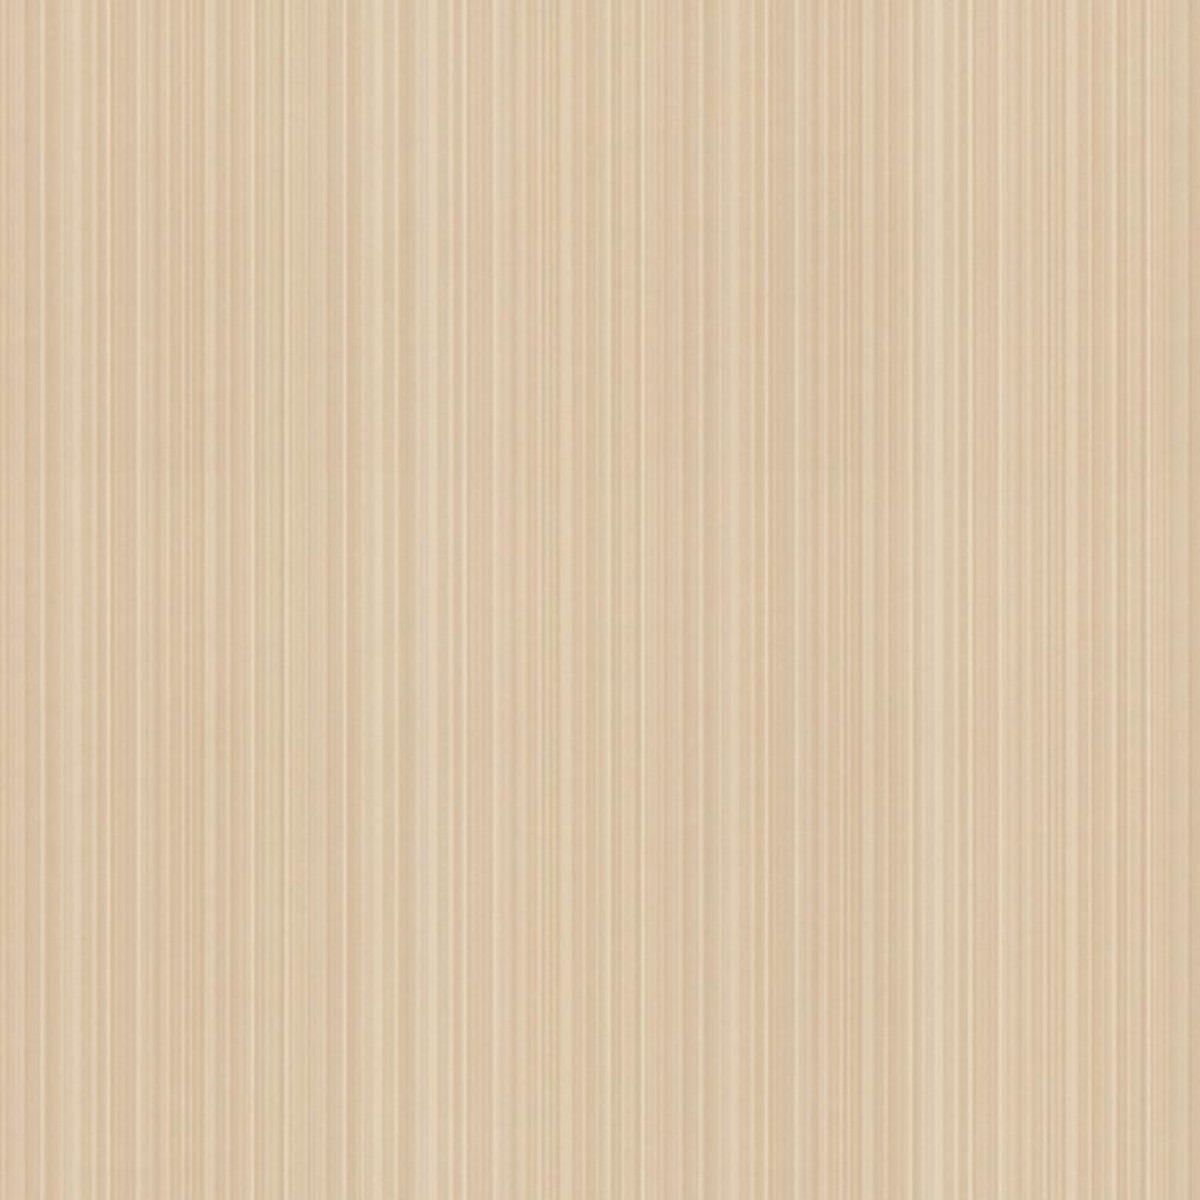 Обои виниловые Aura Texture World бежевые 0.53 м H2990401